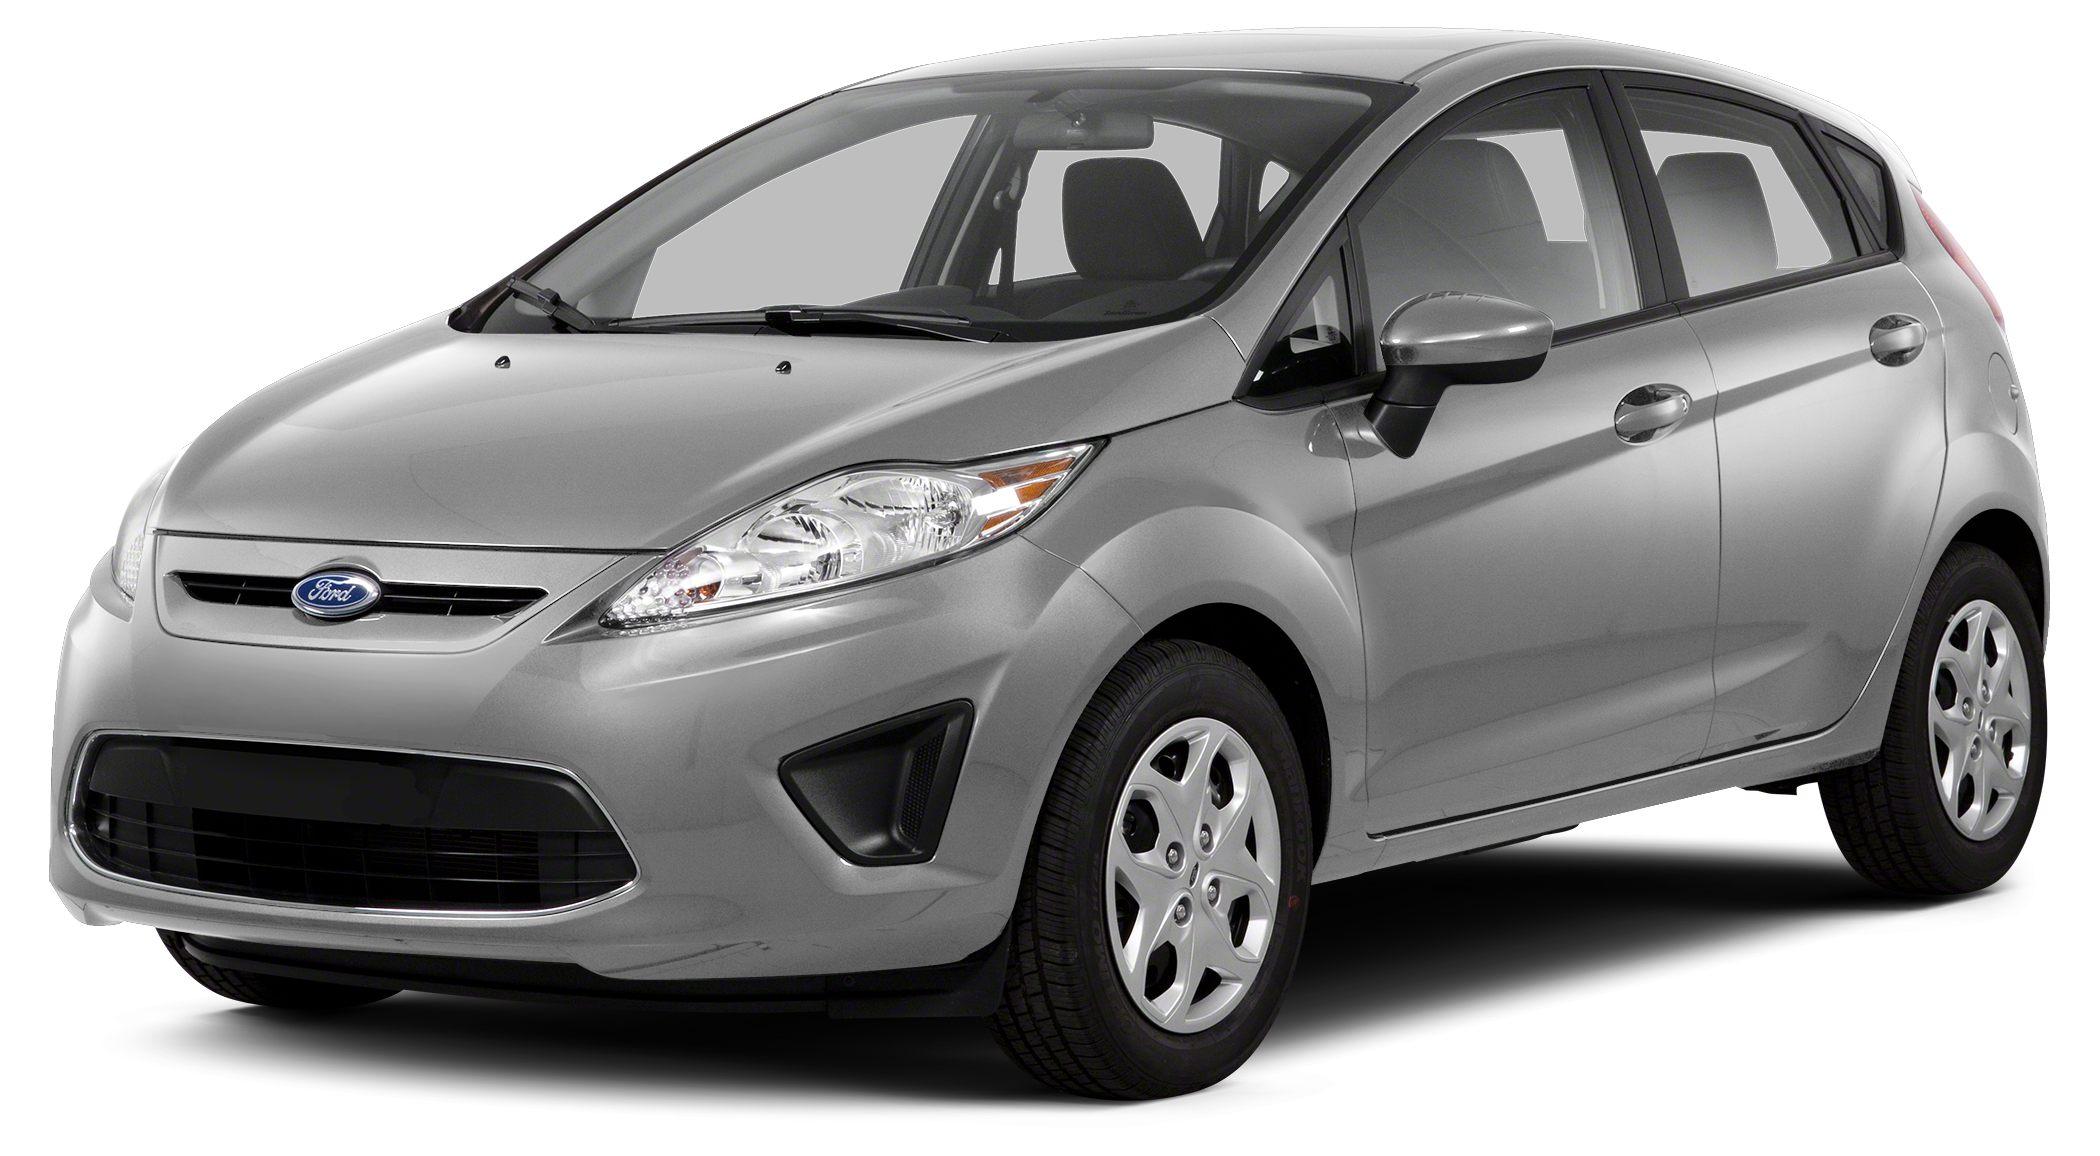 2013 Ford Fiesta Titanium Miles 12303Color Silver Stock R8783Z VIN 3FADP4FJ4DM173386